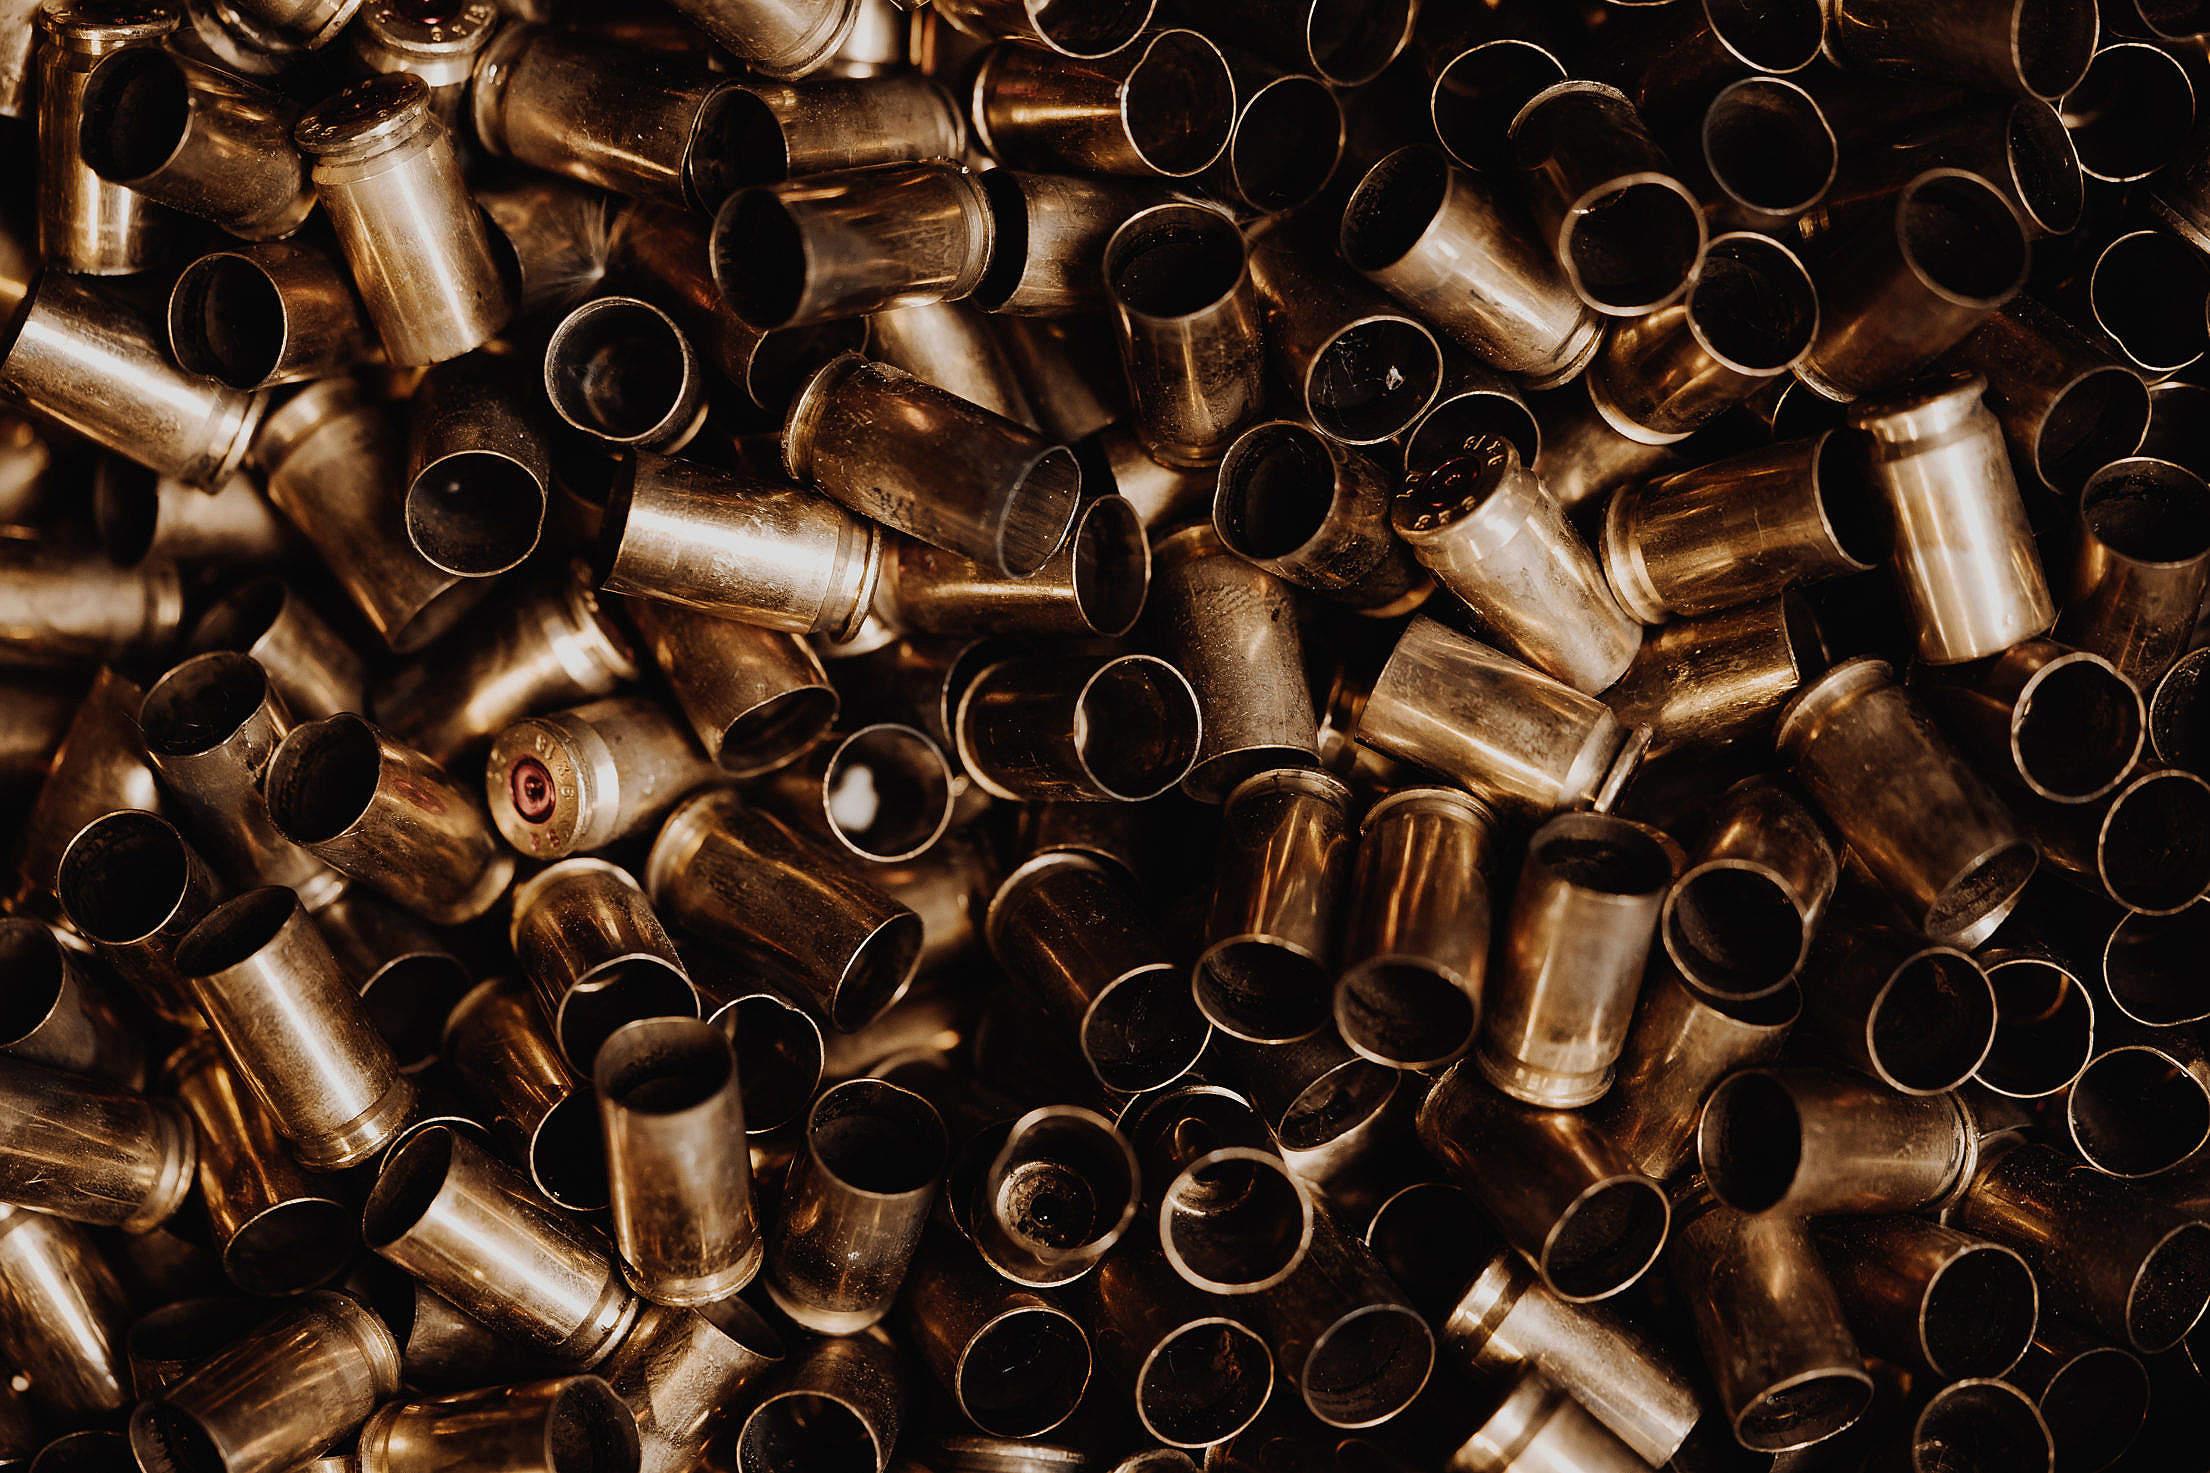 Empty Ammunition on a Pile Free Stock Photo